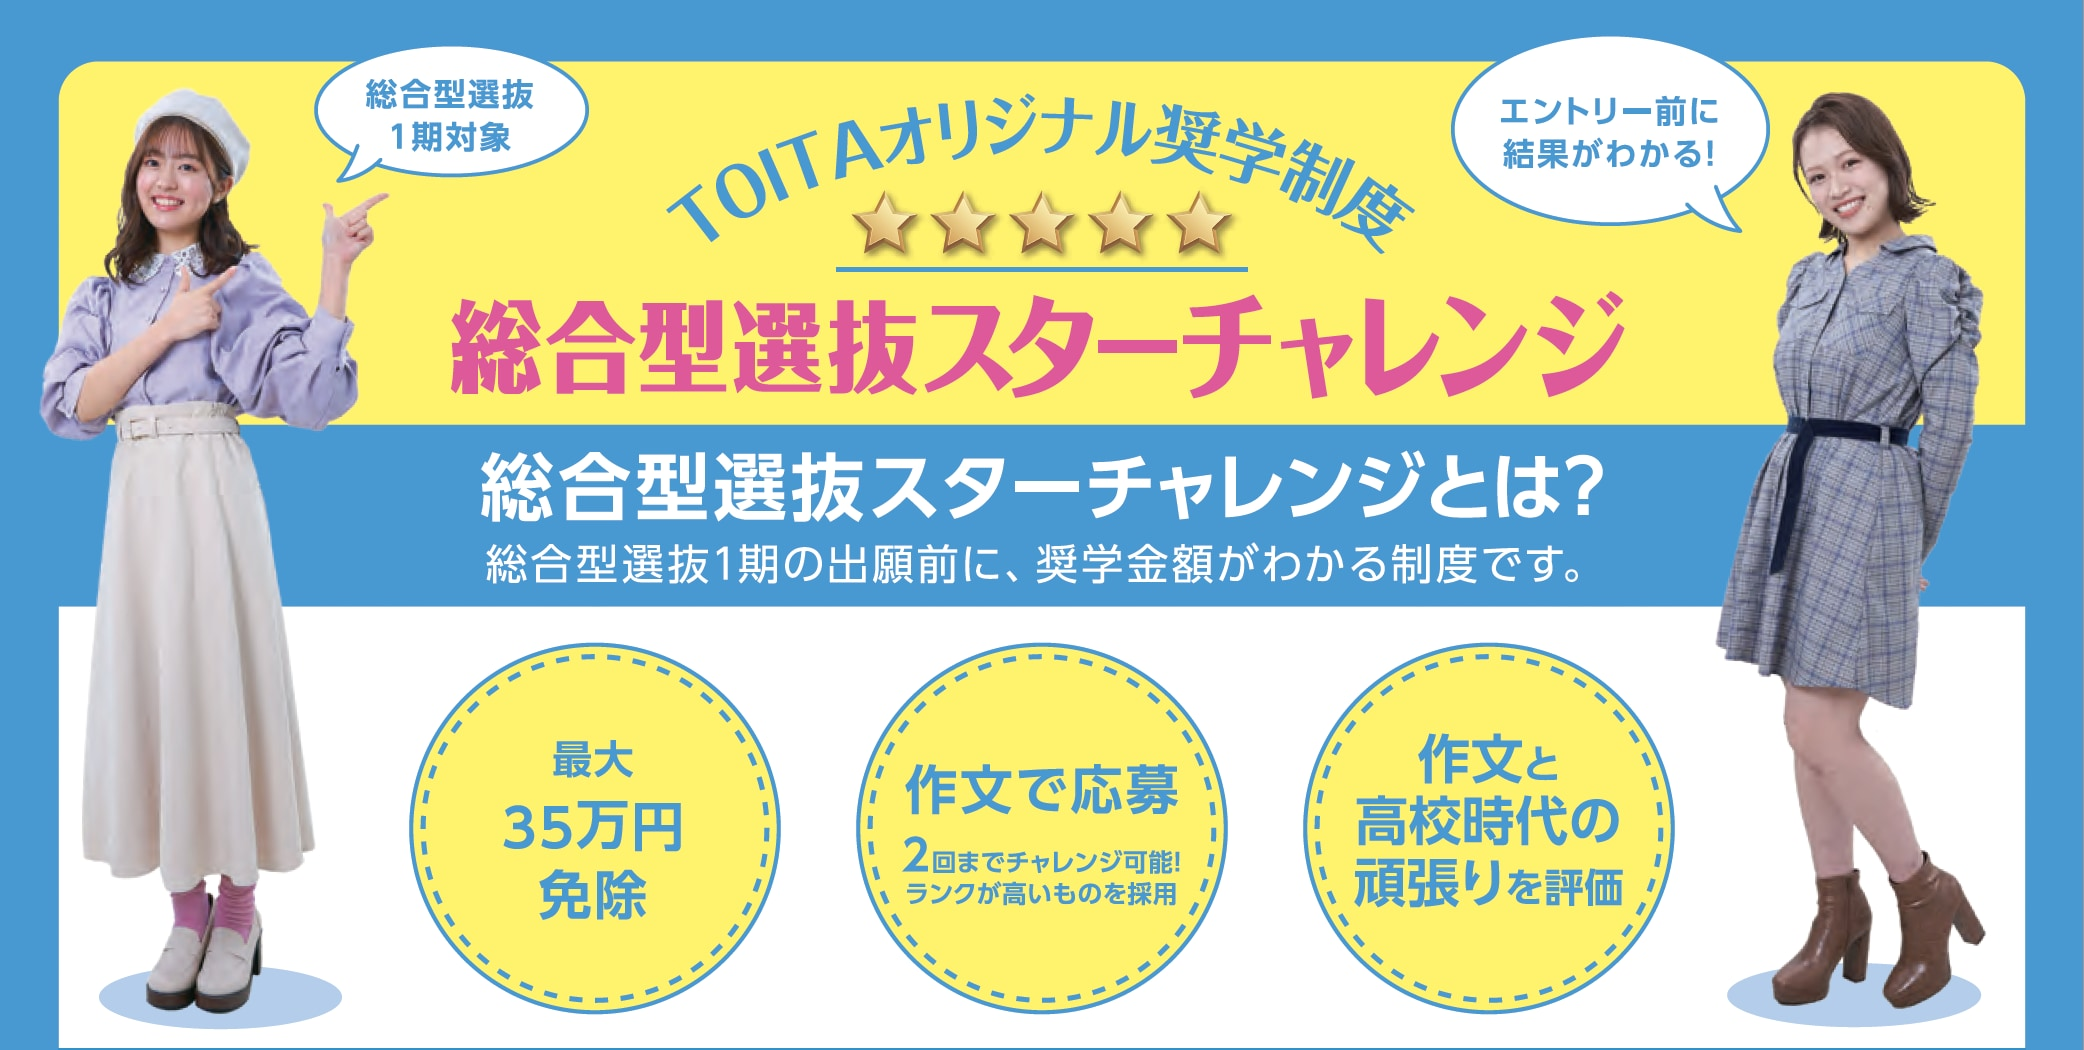 AO入試奨学生にチャレンジしよう!!